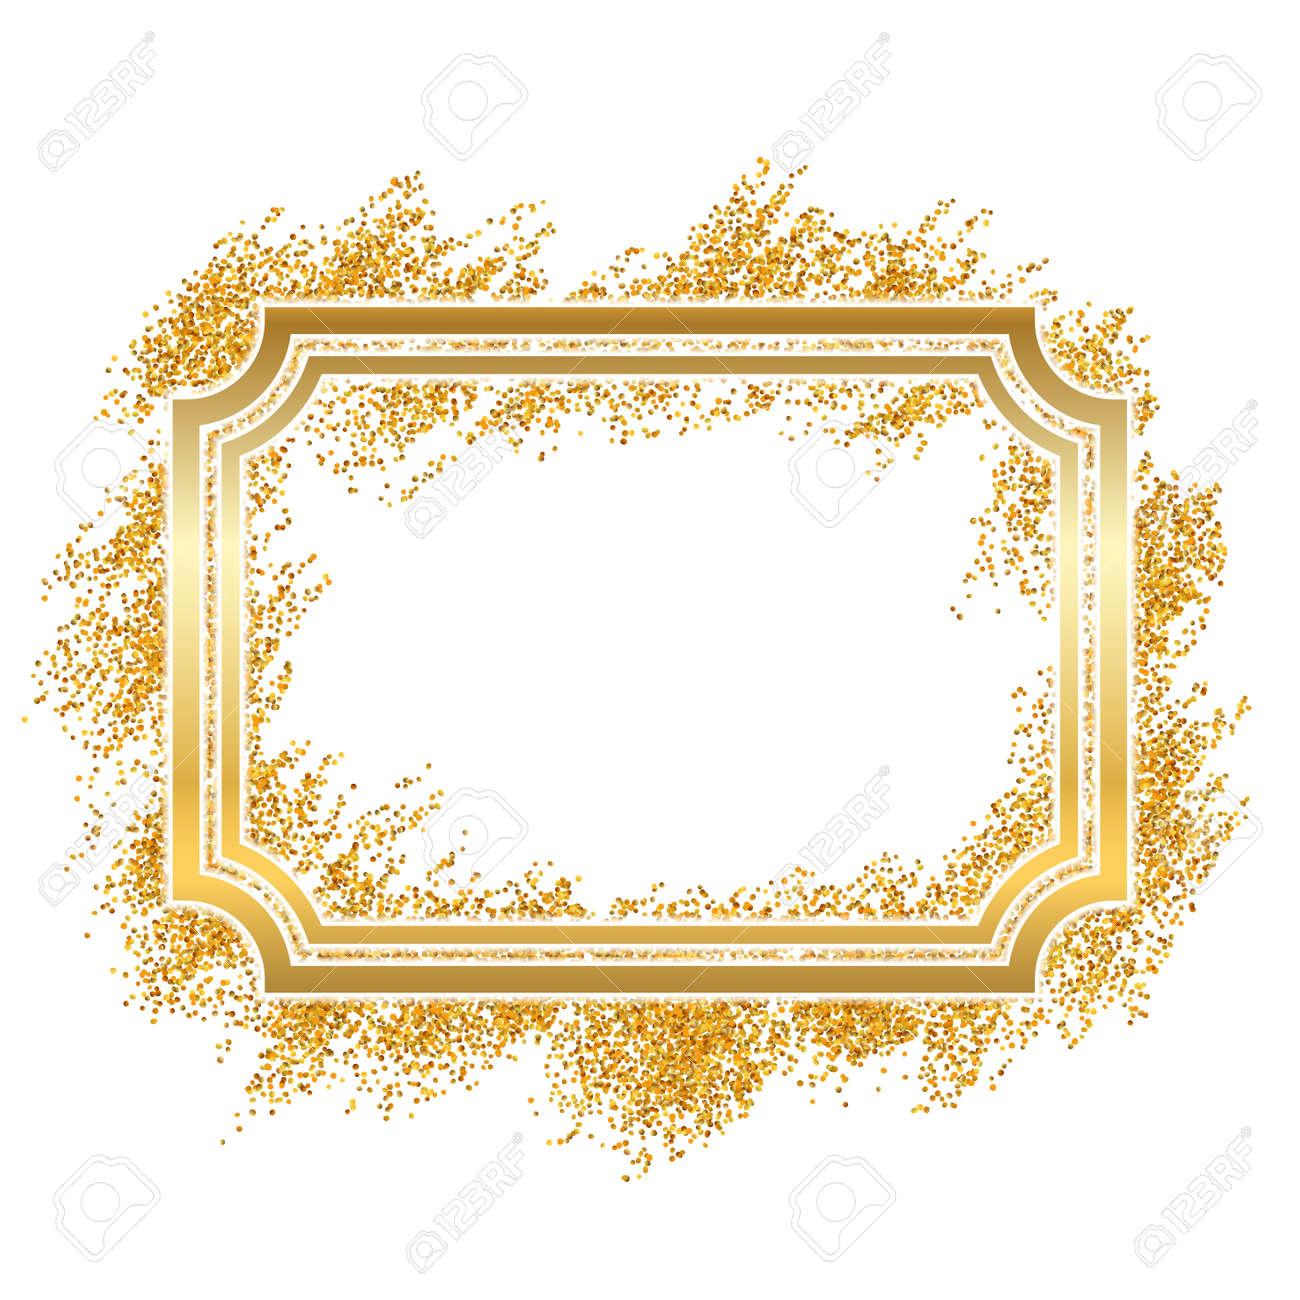 71762fc0ced9 Gold frame. Beautiful golden glitter design. Vintage style decorative  border